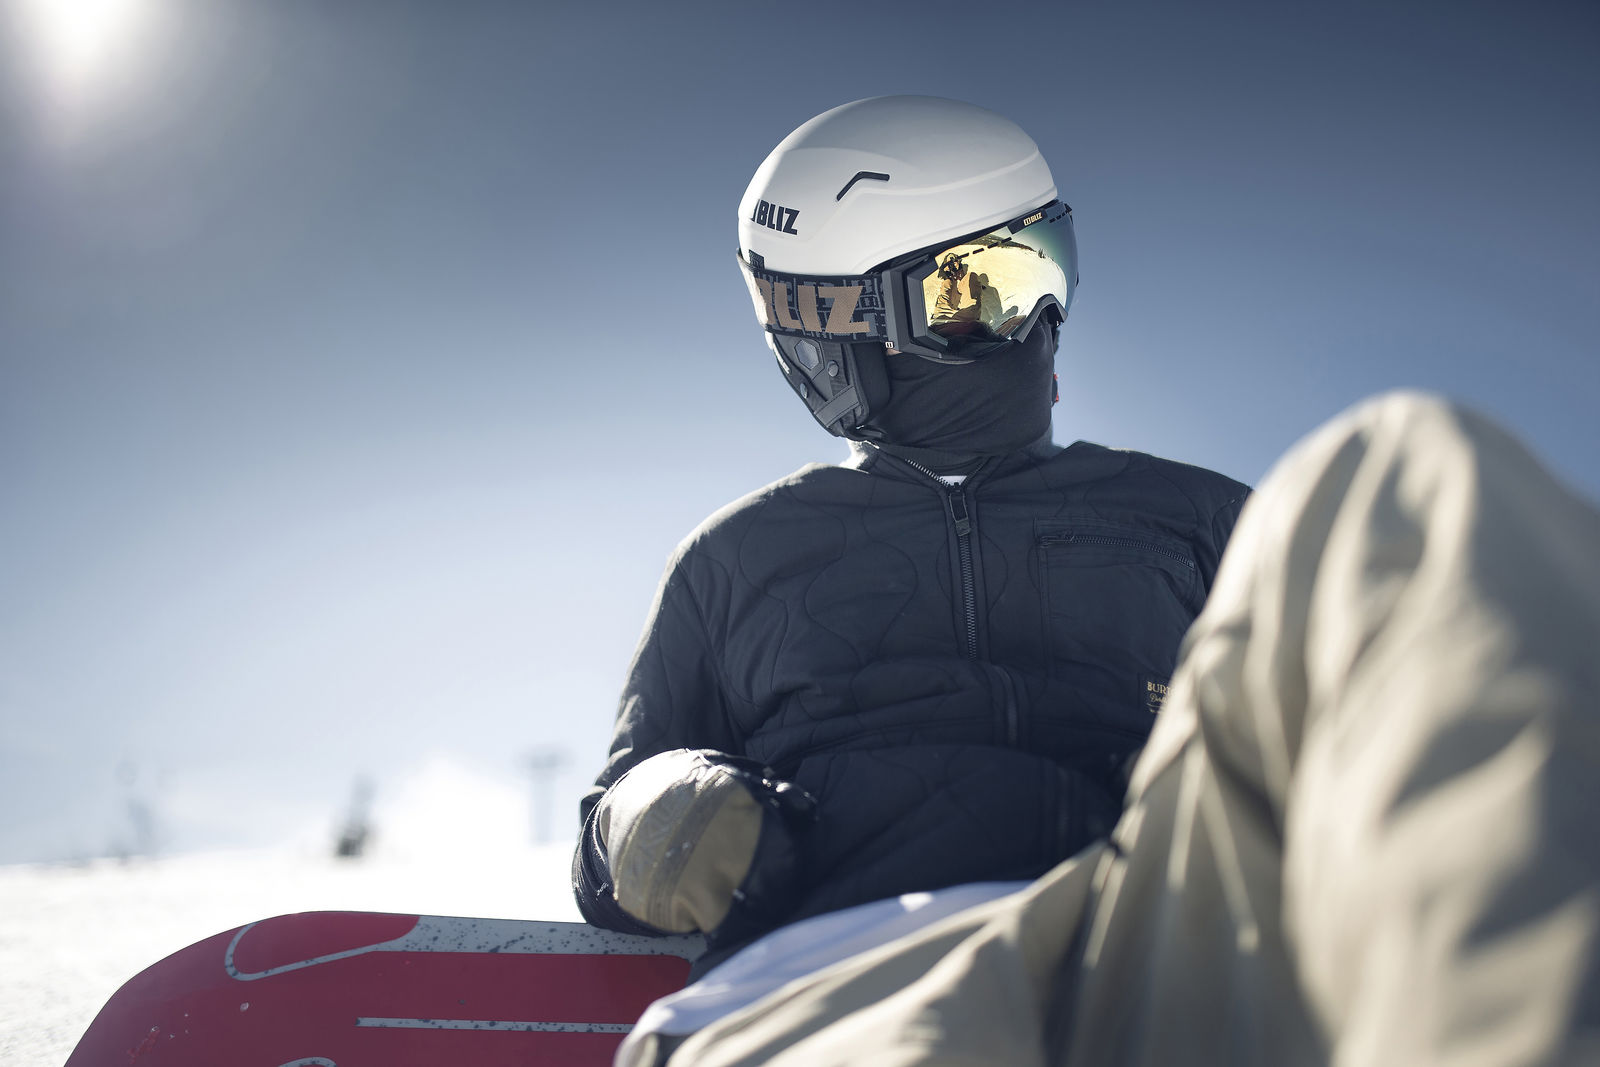 32440-19-carver-55808-00-evo-bliz-ski-goggles-snowboard-blue-ski-helmet-goggles-lifestyle2-medium.jpg